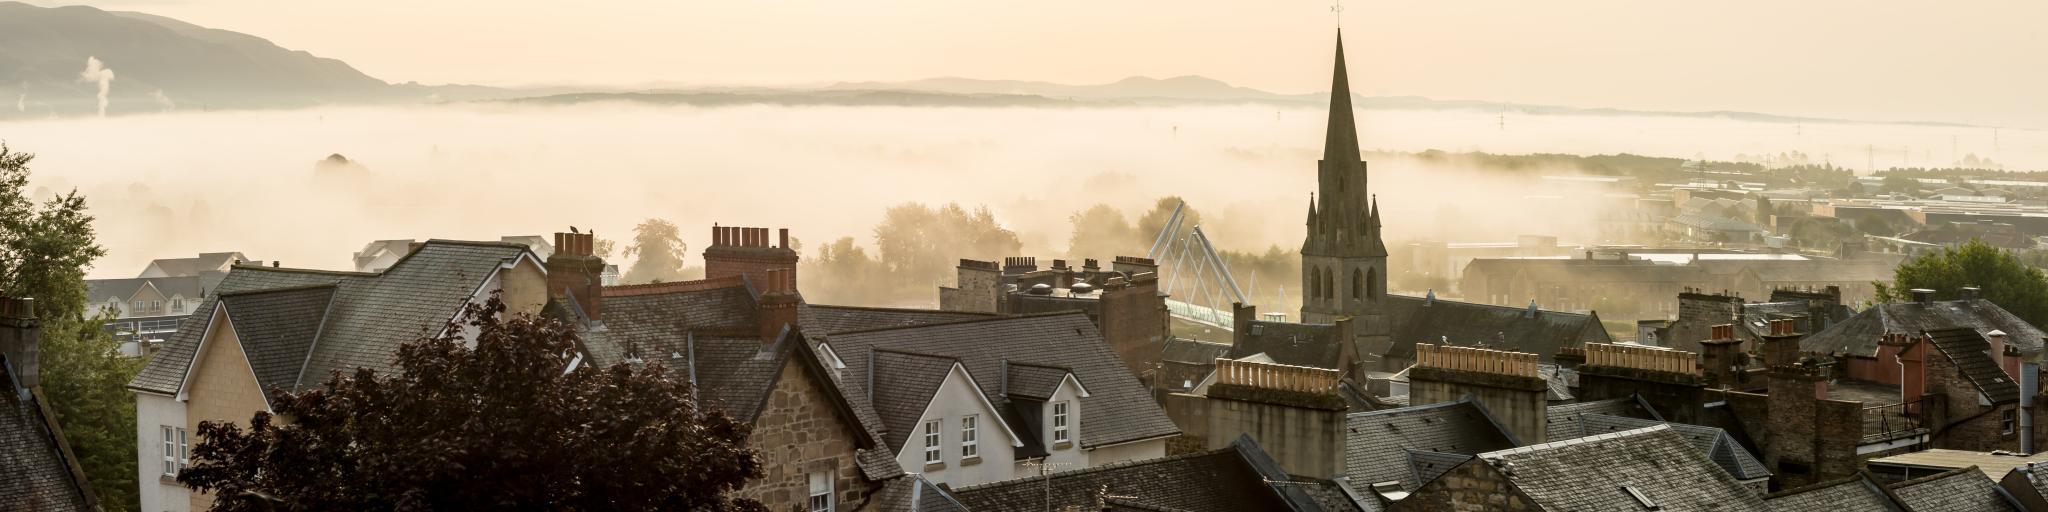 Day trip from Edinburgh to Stirling, Scotland - morning haze